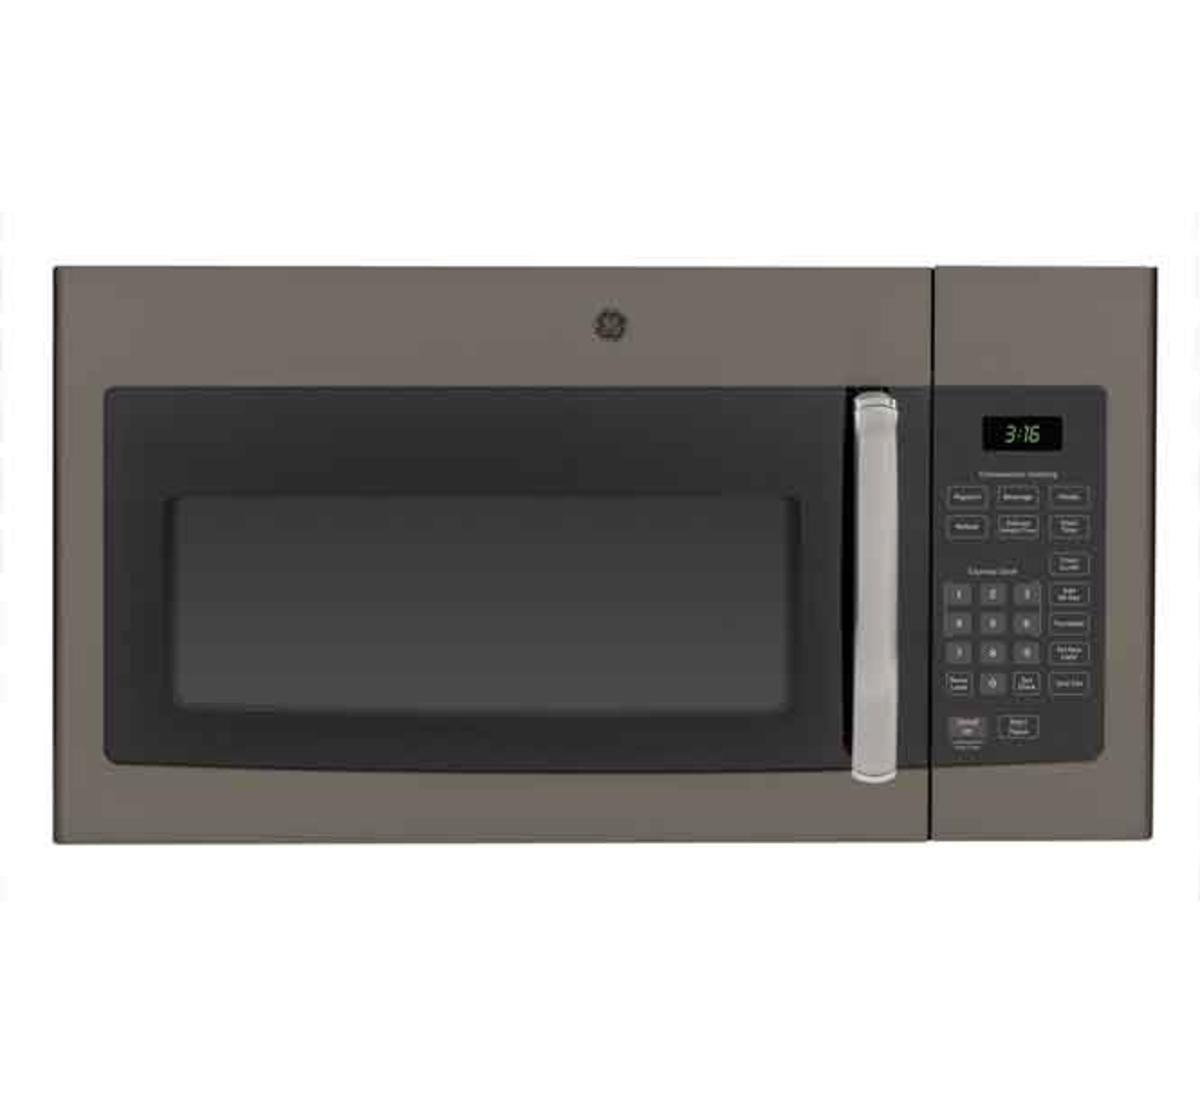 g e over the range microwave